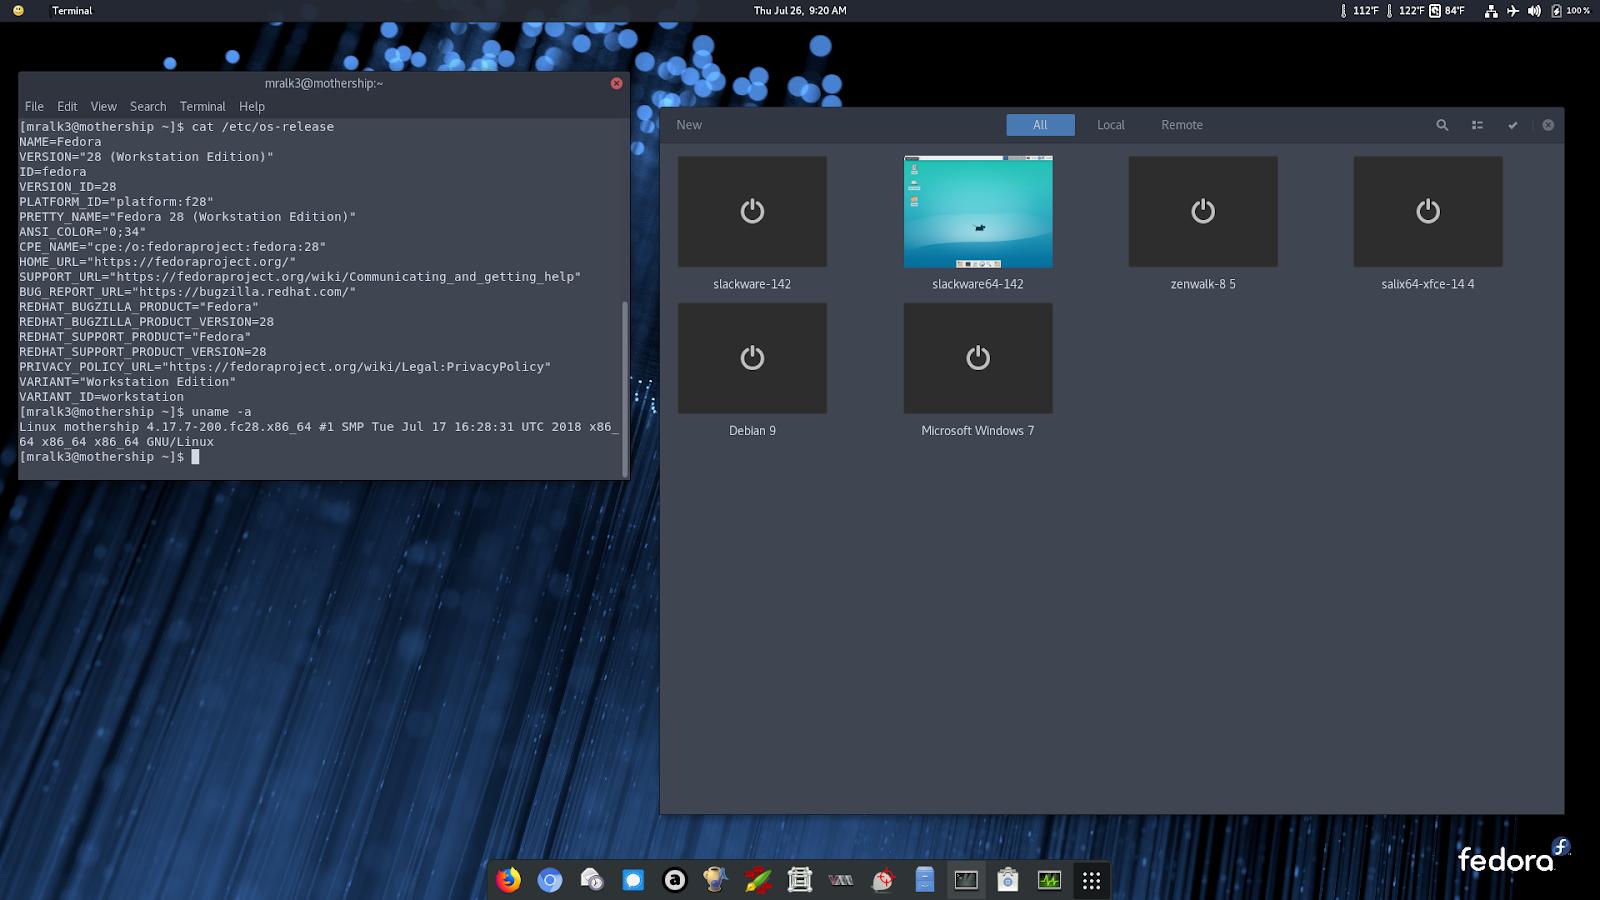 Exit Status One: Run Slackware 14 2 in GNOME Boxes on Fedora 28